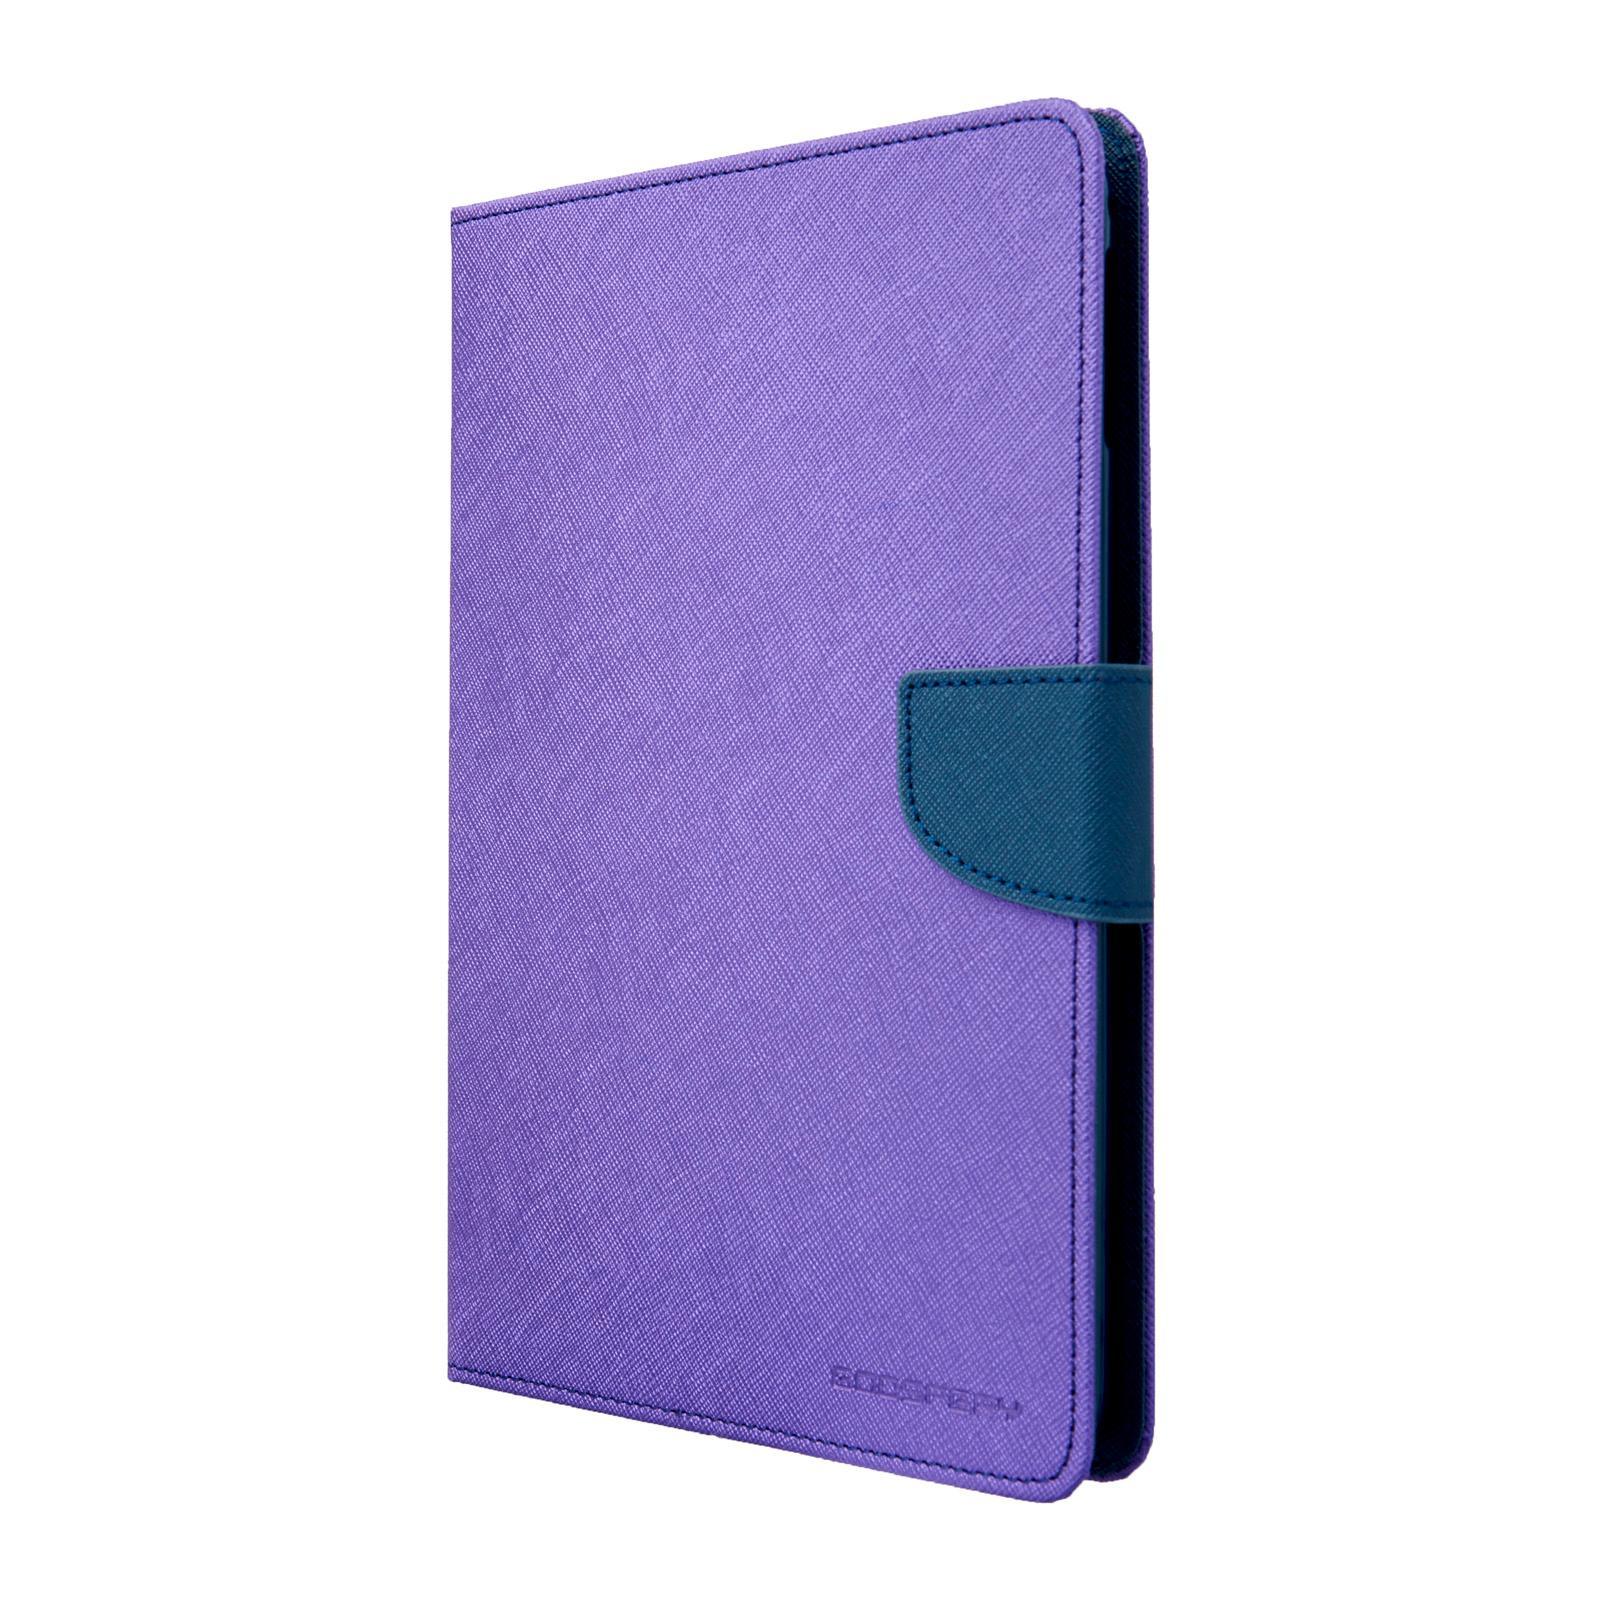 Pouzdro / kryt pro Apple iPad mini 4 - Mercury, Fancy Diary Purple/Navy